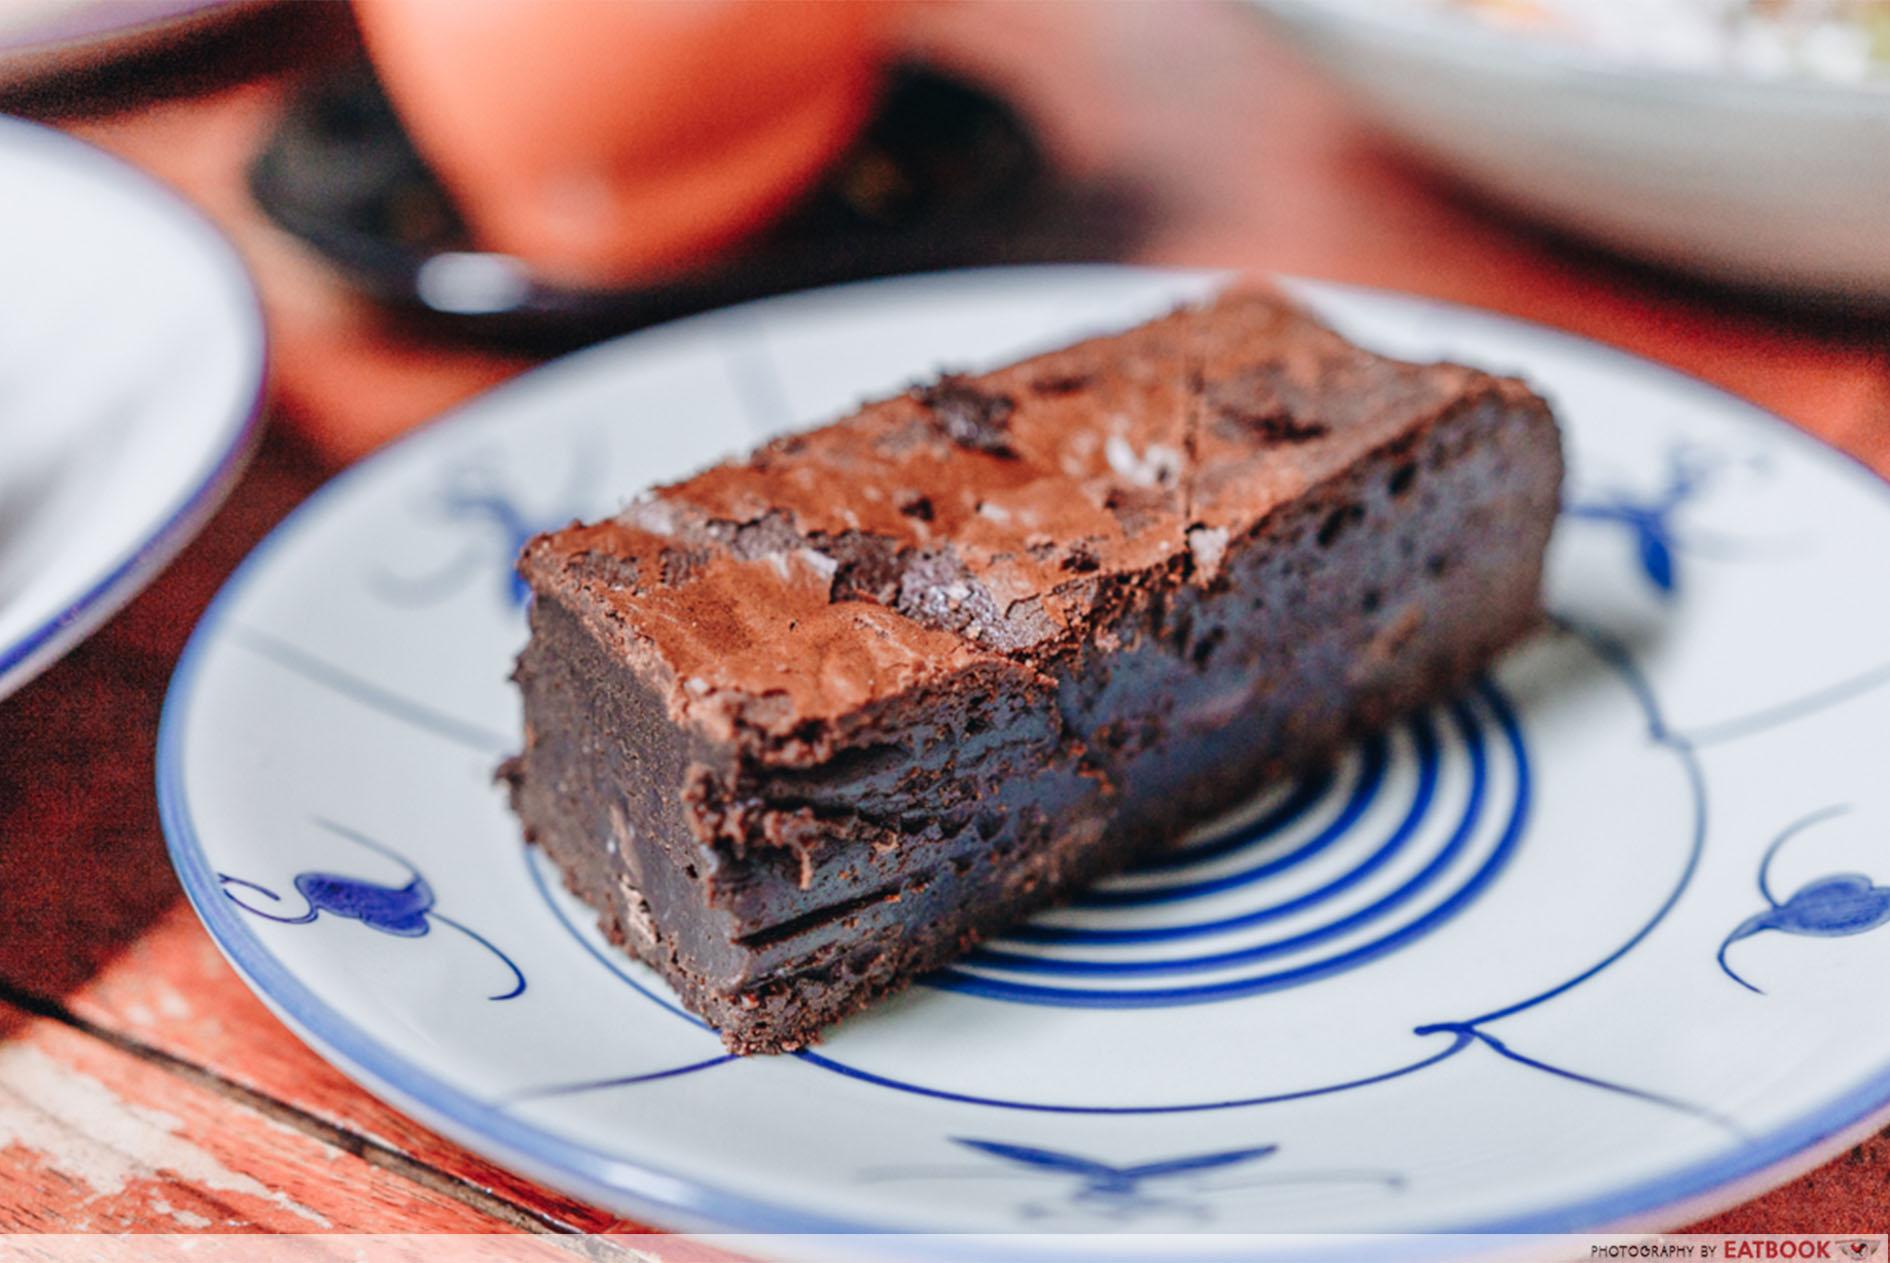 Chope Dessert Delivery - Sarnies